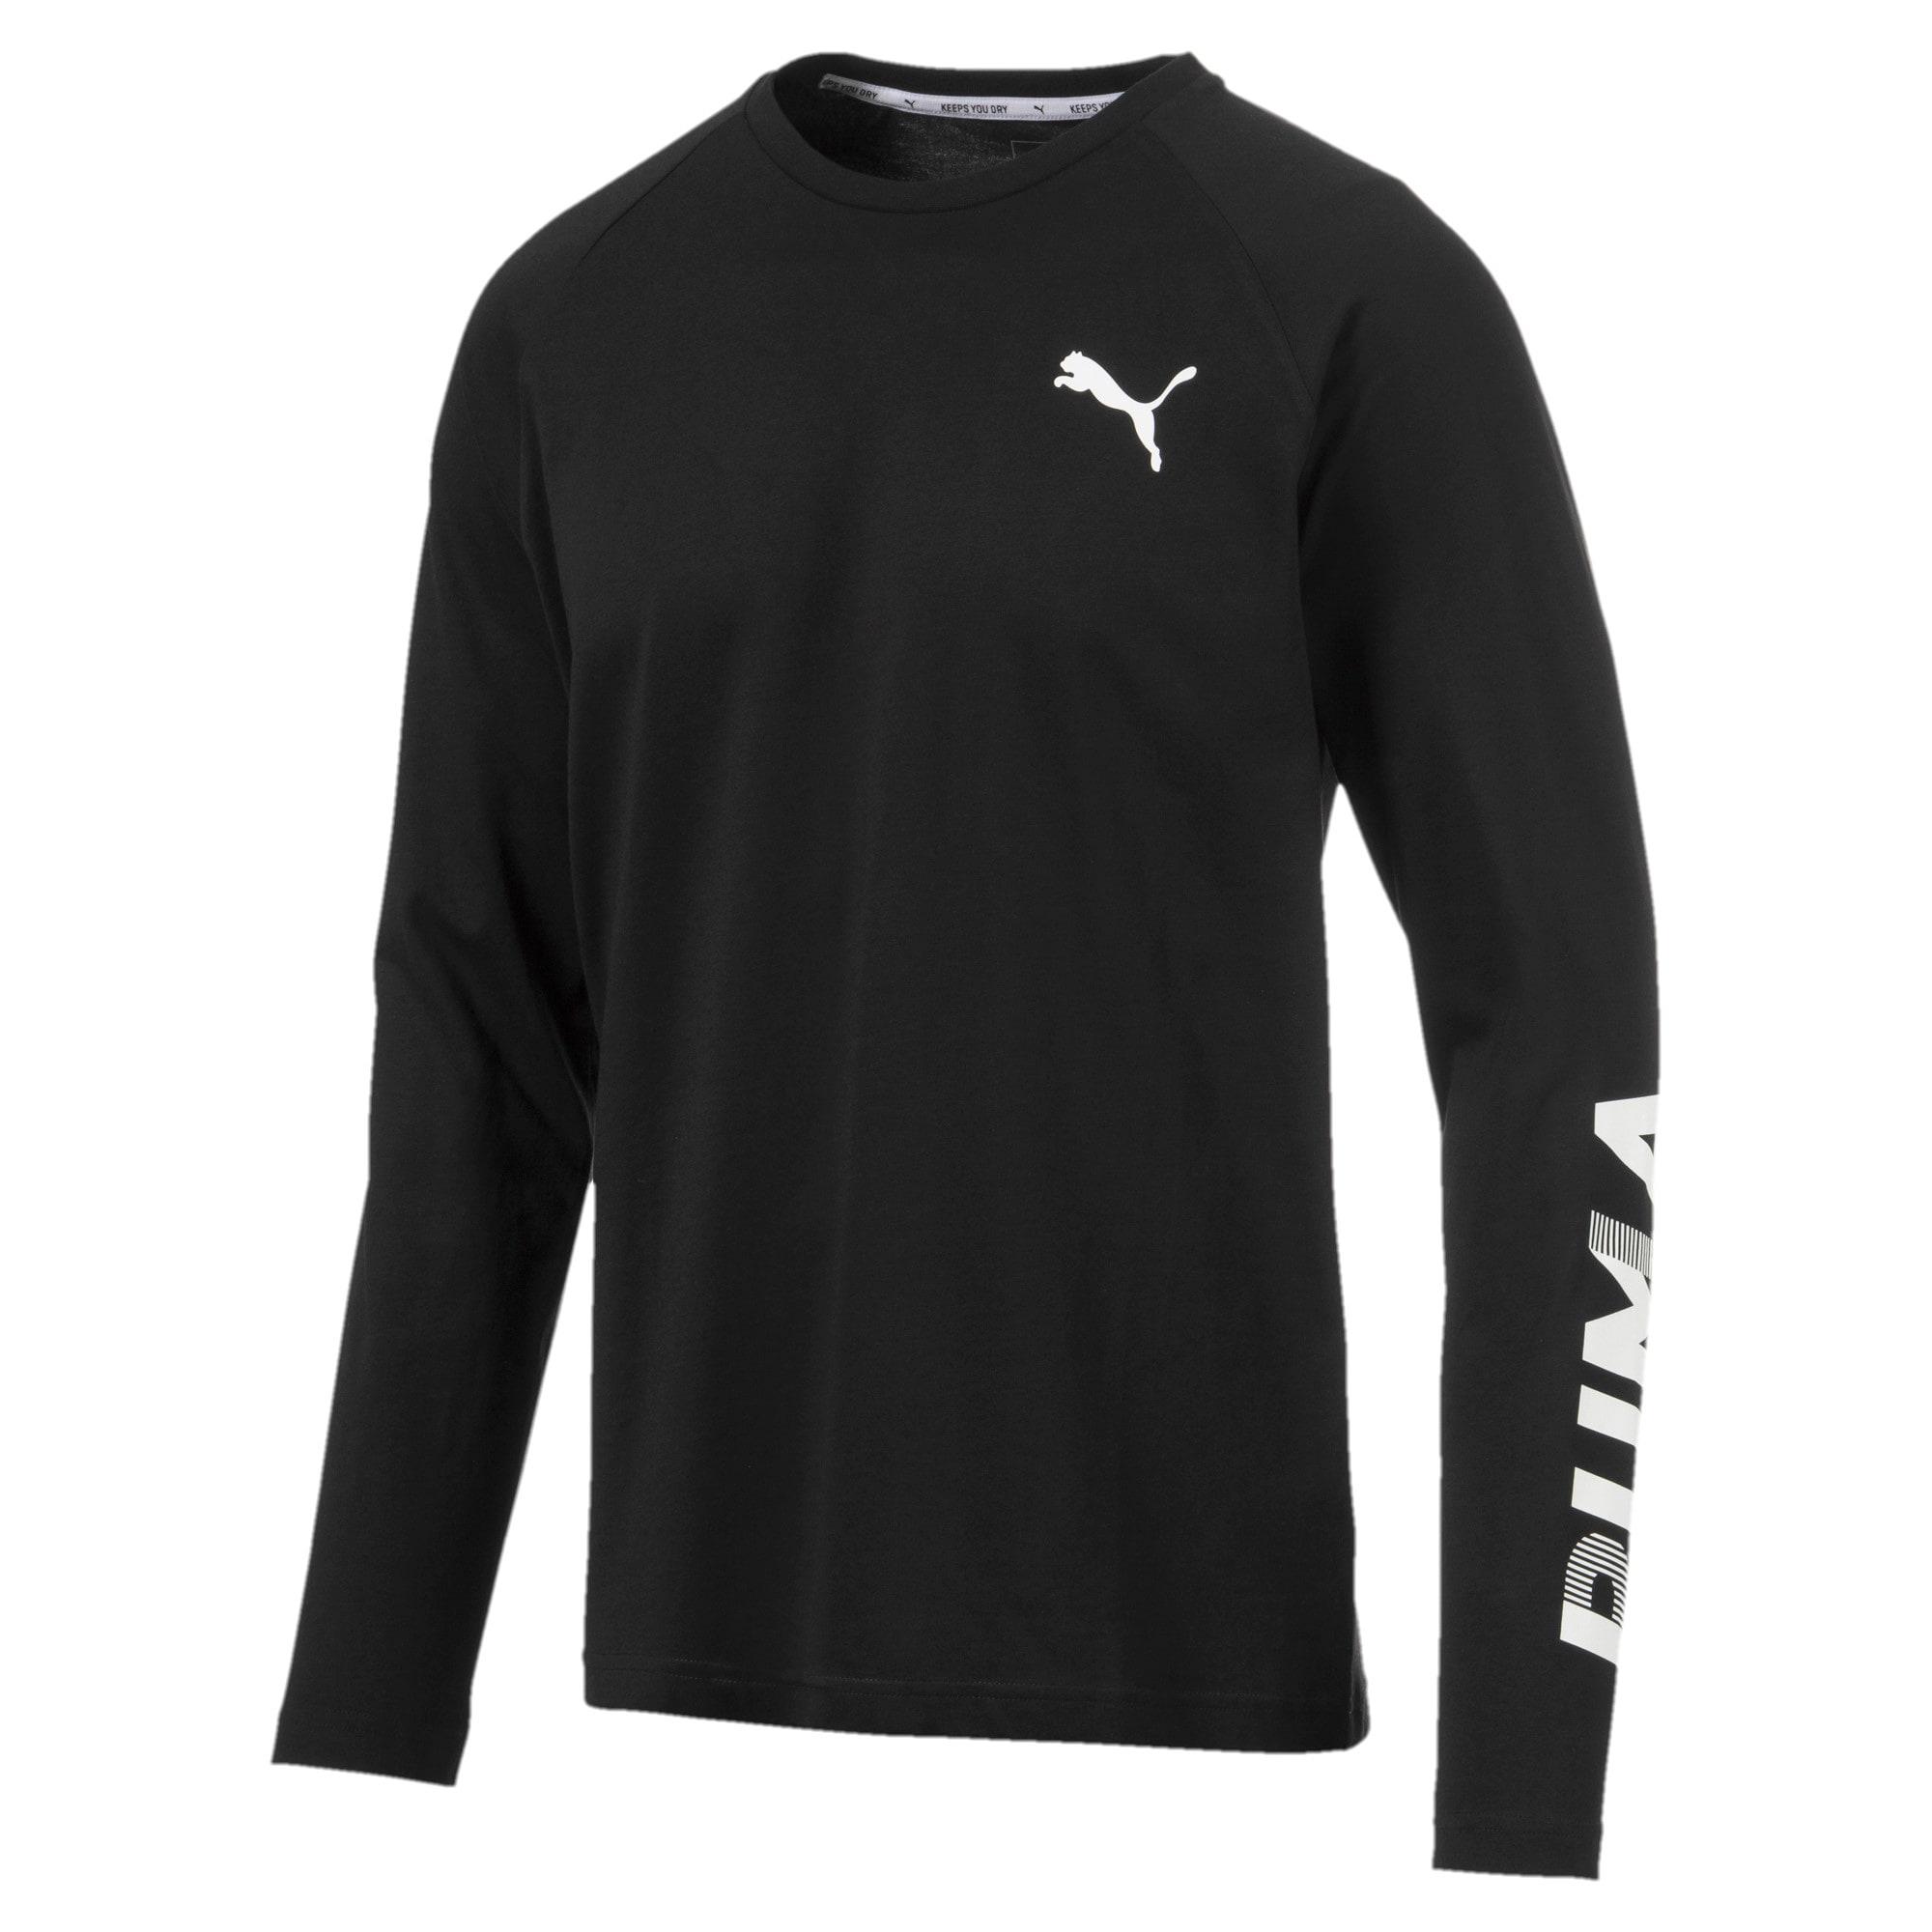 Thumbnail 1 of Modern Sports Men's Long Sleeve Tee, Puma Black, medium